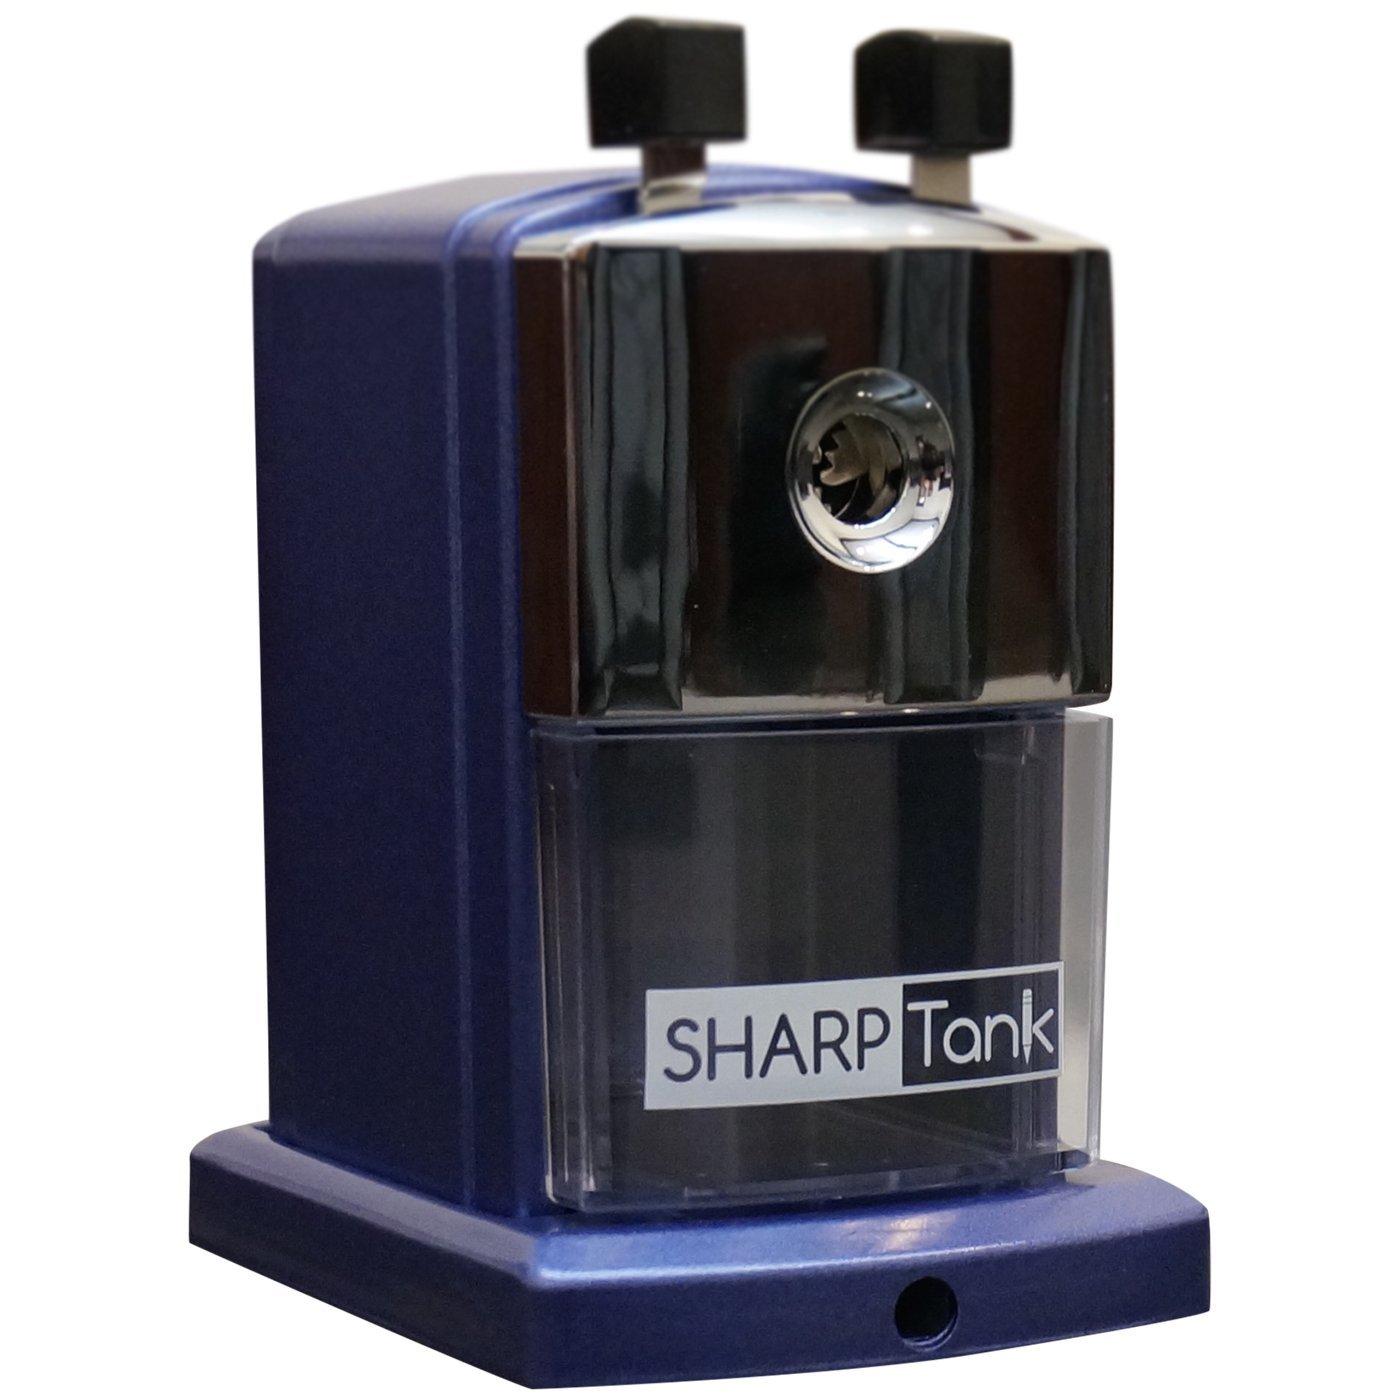 SharpTank - Portable Pencil Sharpener (Metallic Plum) - Compact & Quiet Classroom Sharpener That Gets Straight to The Point! by SHARP TANK